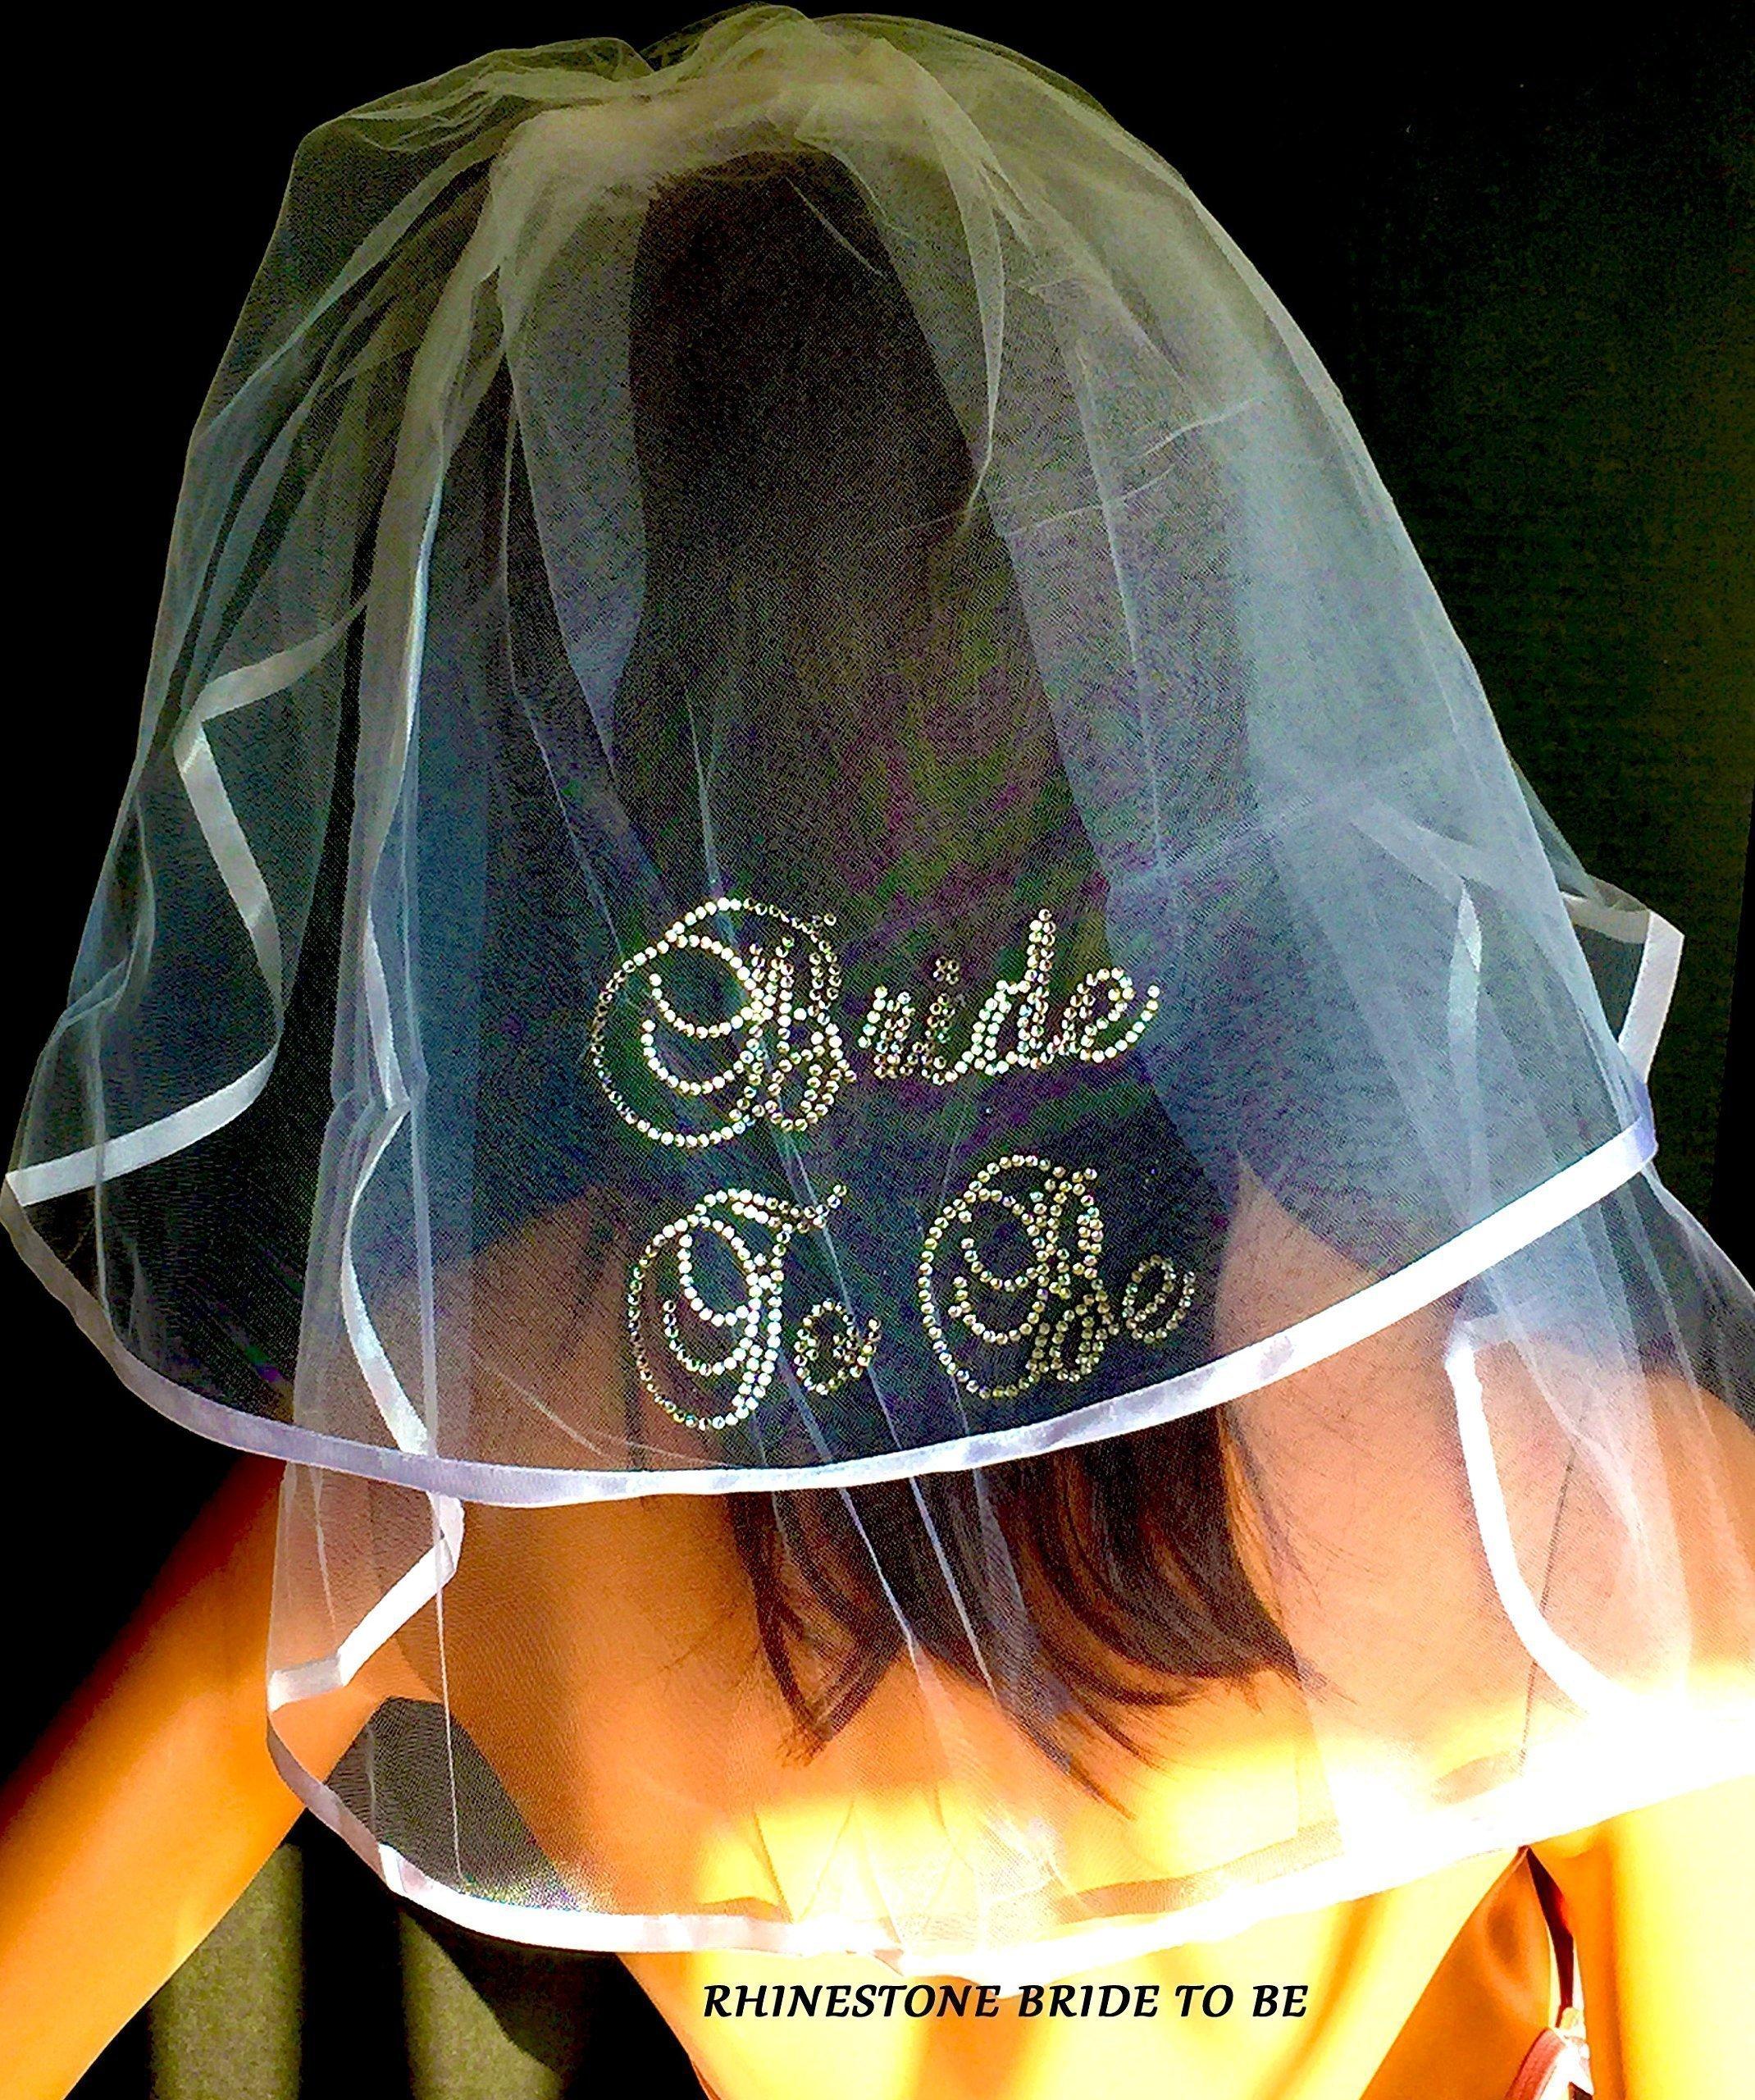 Rhinestone Bride To Be Veil, Bridal Shower Veil, Wedding Veil by SashANation